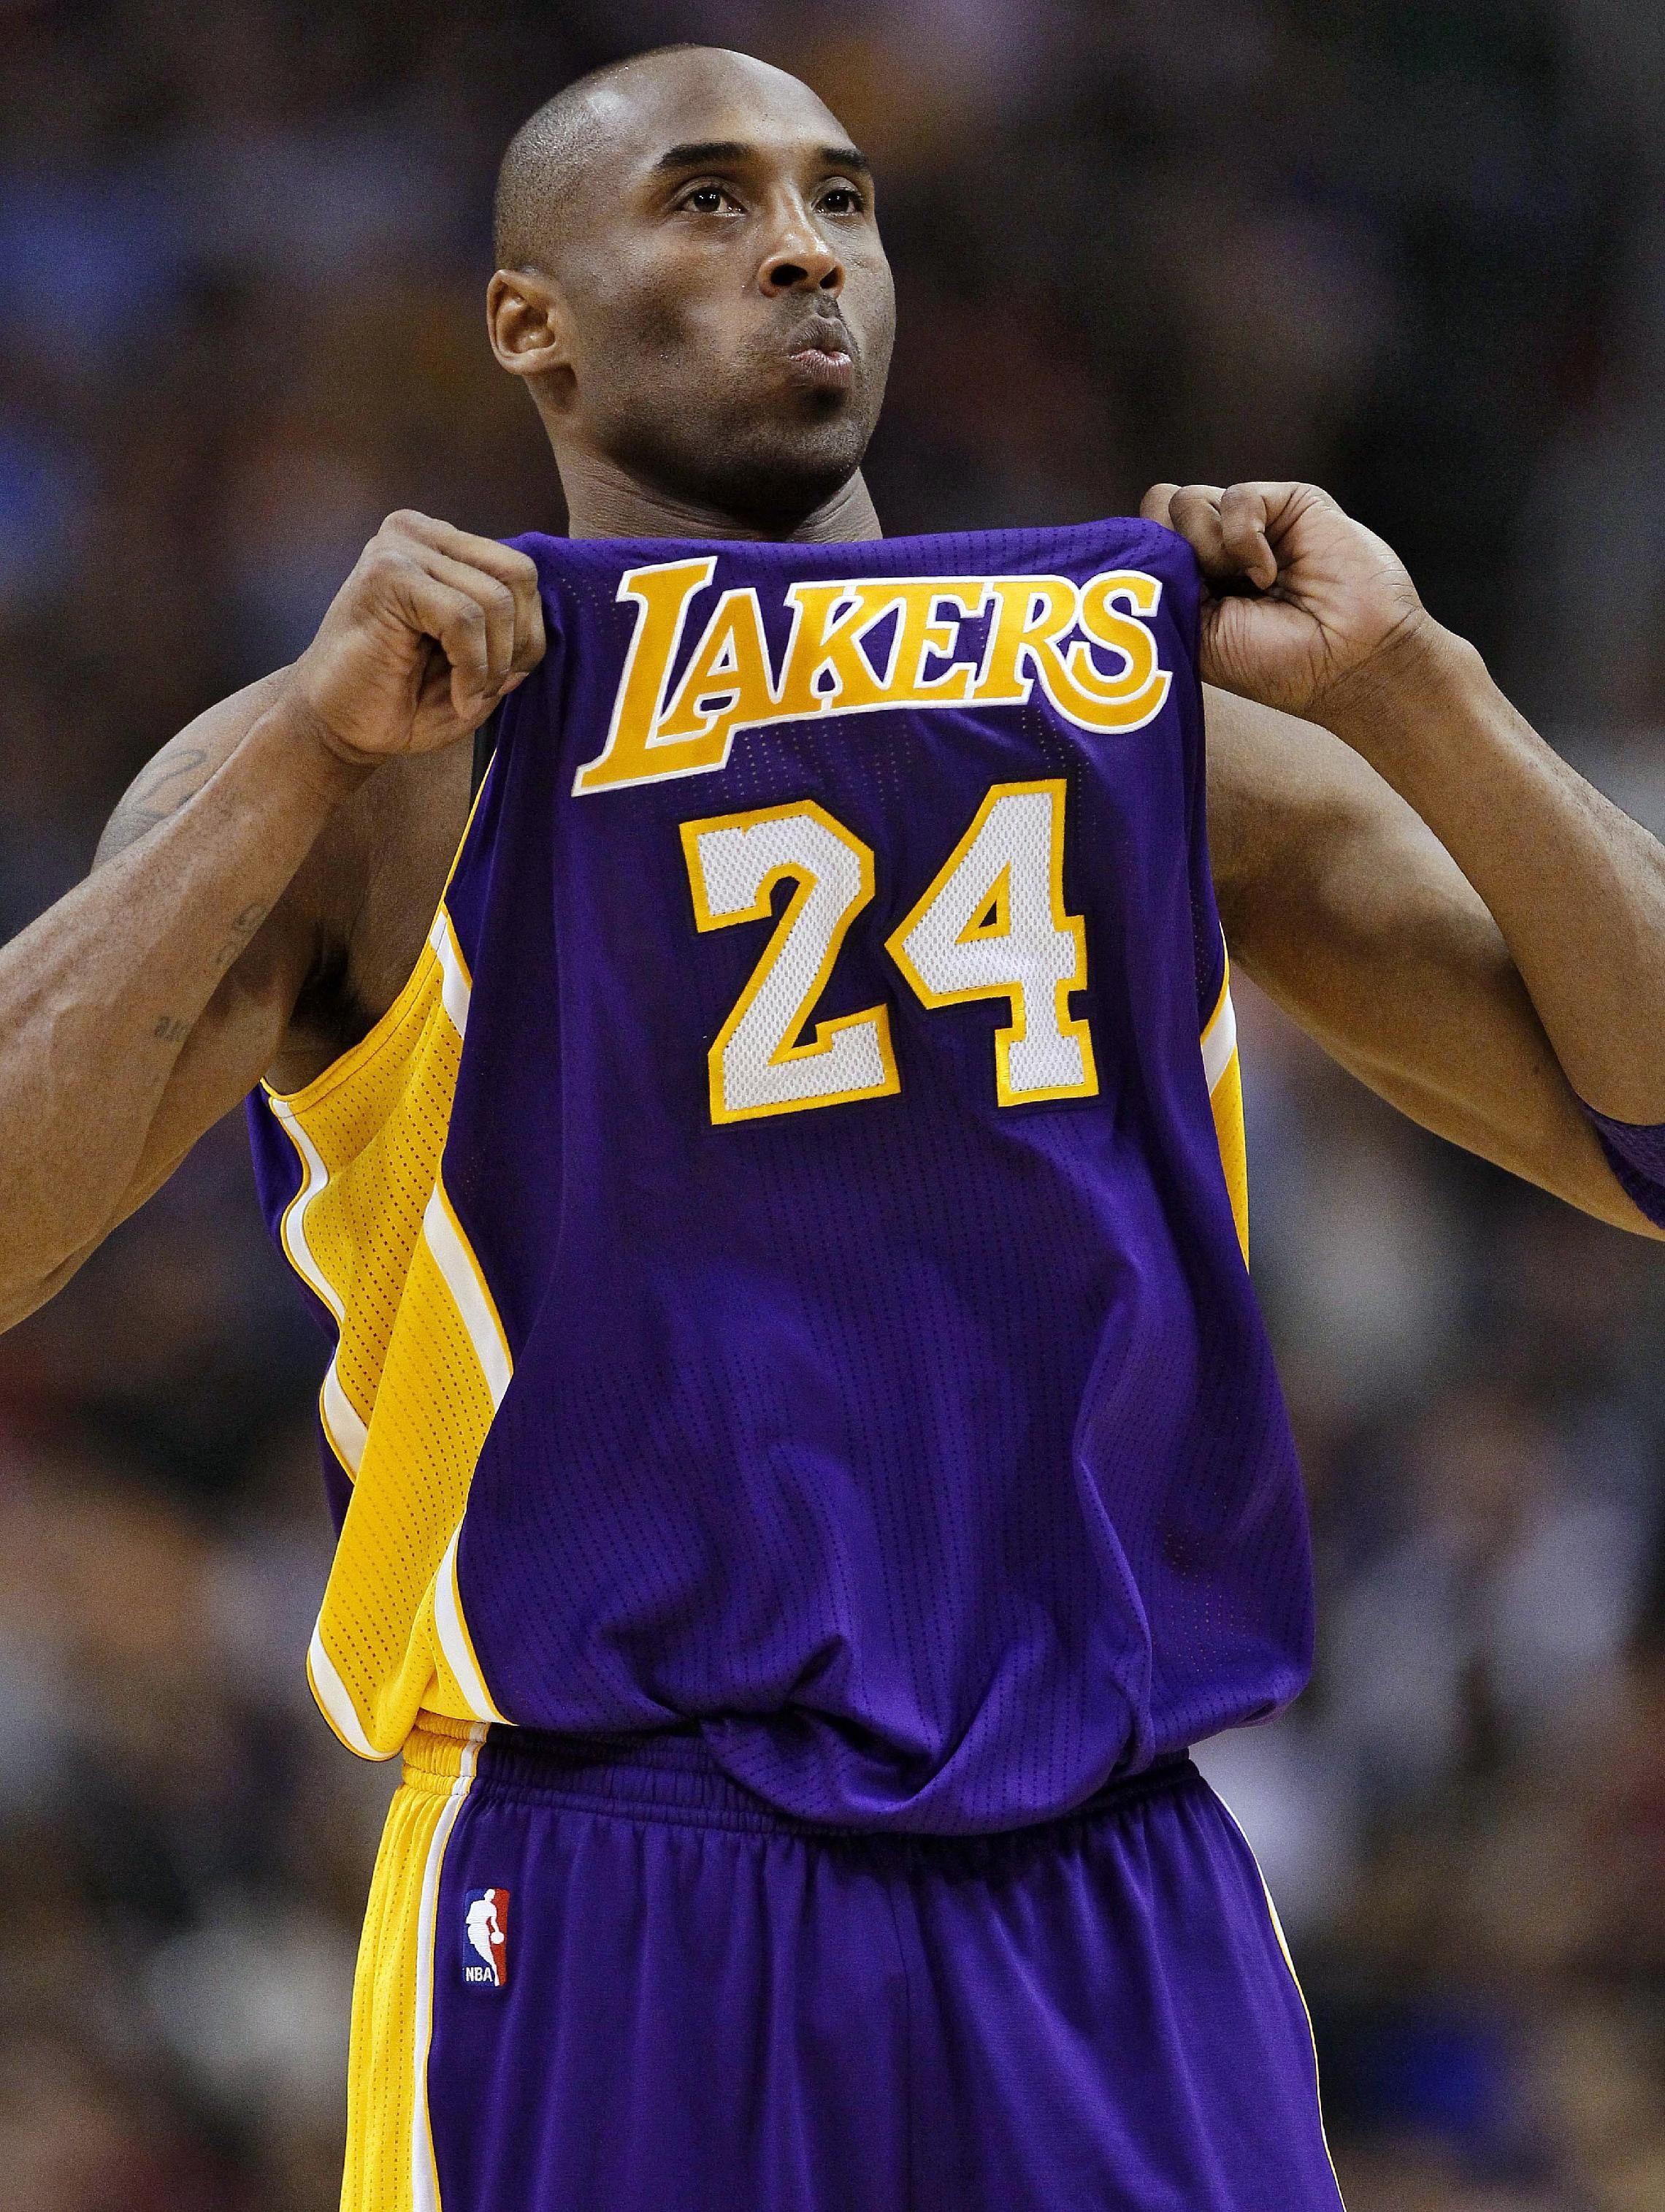 Lakers Nation Kobe Bryant Kobe Bryant Black Mamba Kobe Bryant Cartoon Kobe Bryant Nba Kobe Bryant Quotes Ko Kobe Bryant Quotes Kobe Kobe Bryant Wallpaper